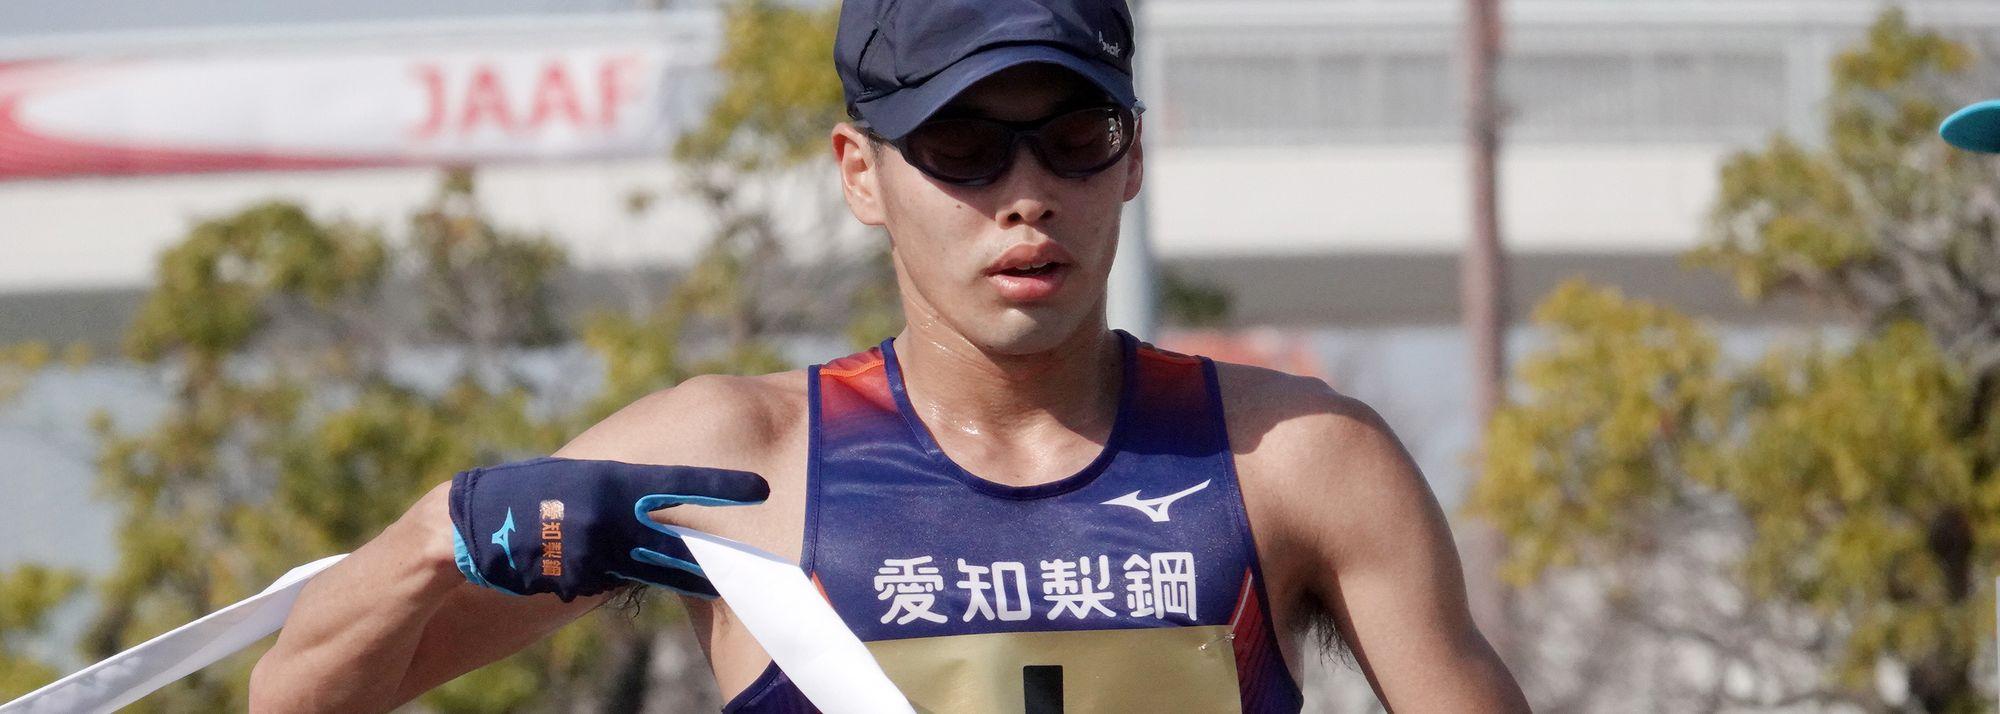 The sun shone for Toshikazu Yamanishi at the 104th Japanese Championships in Kobe.